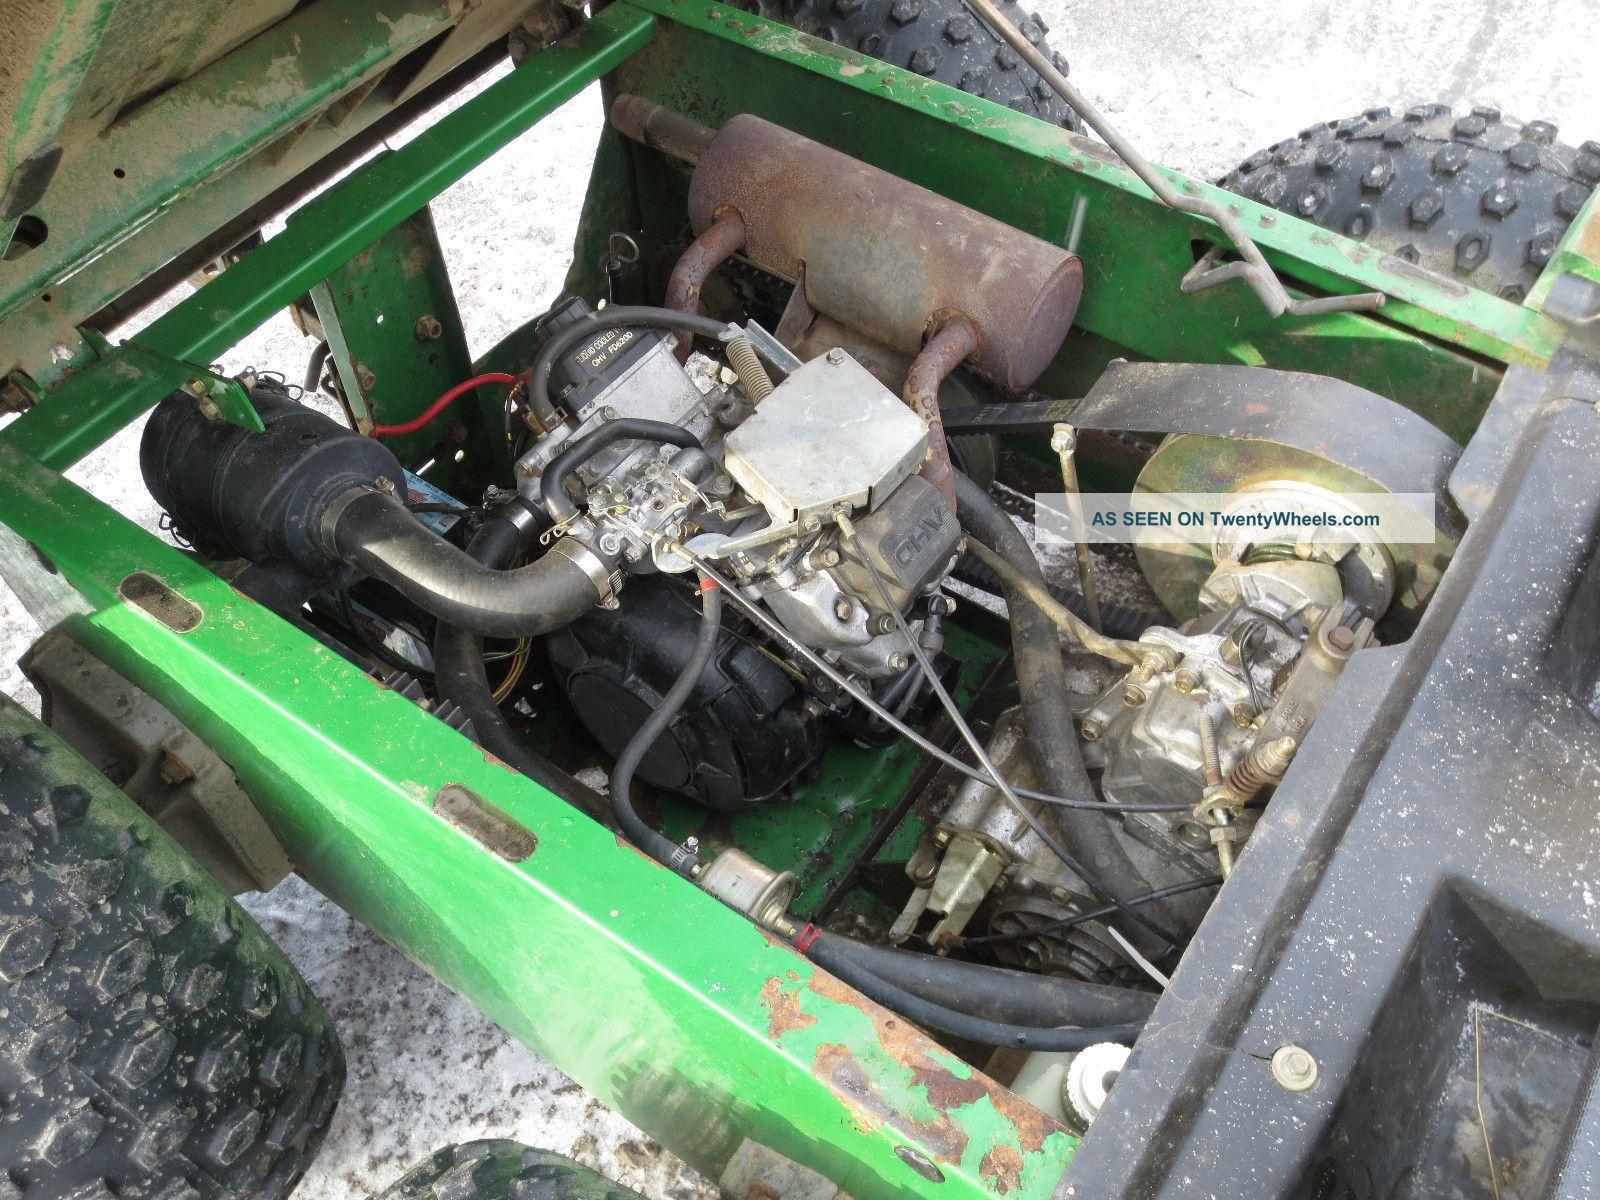 John Deere Gator Kawasaki Engine Best Deer Photos Diagram 4x6 4x4 Gas Dump Utility Mini Truck Utv